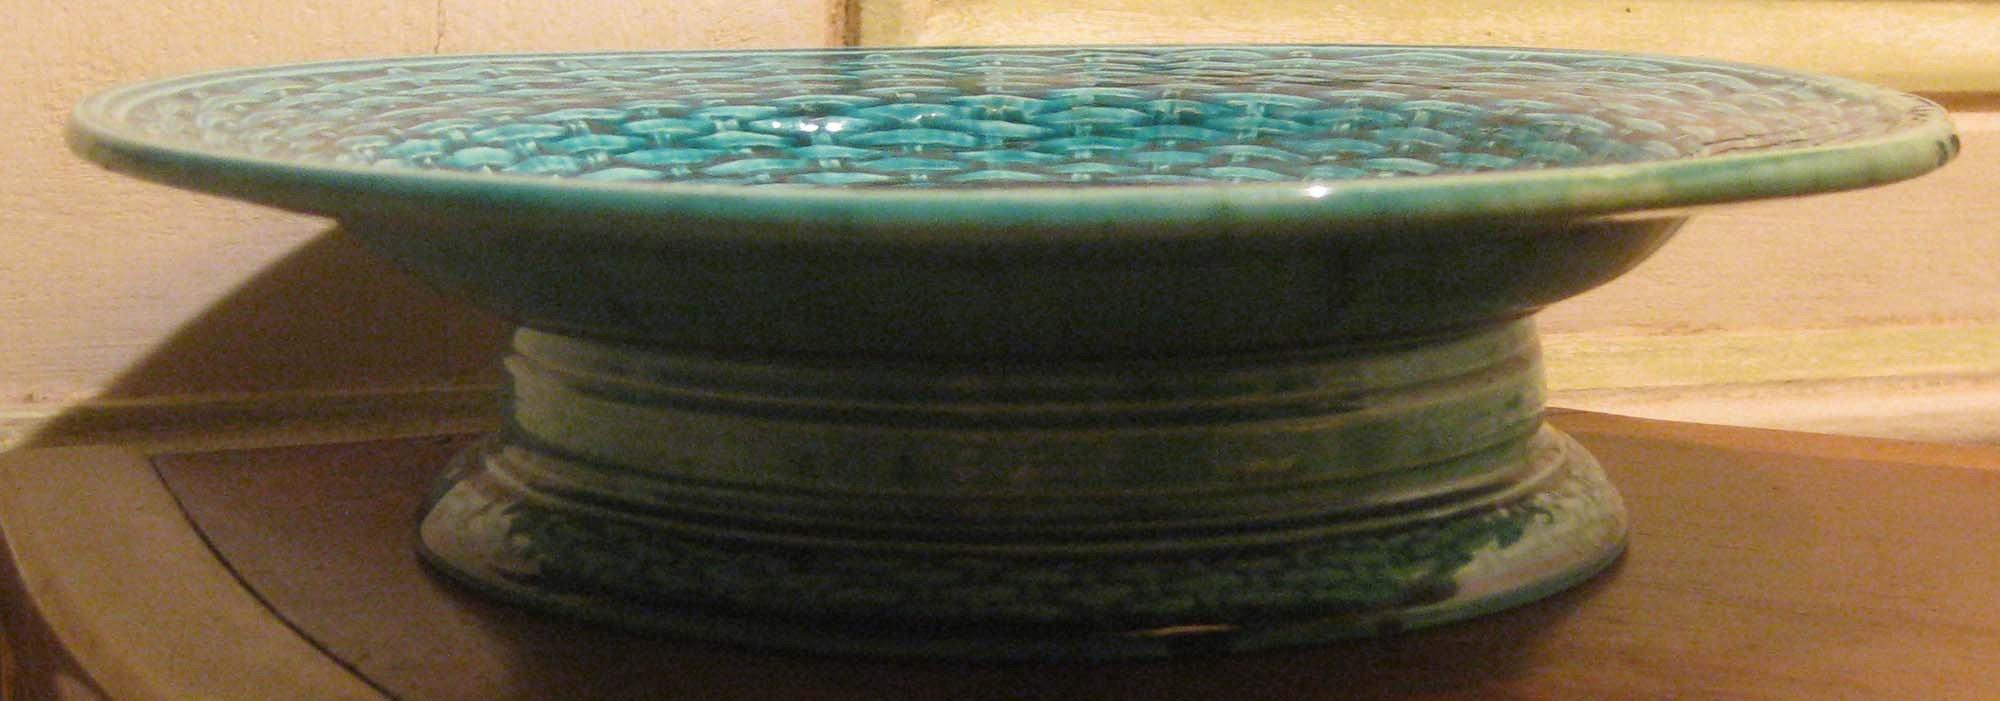 galerie-bosetti-antiquites RUBELLES coupe sur pied